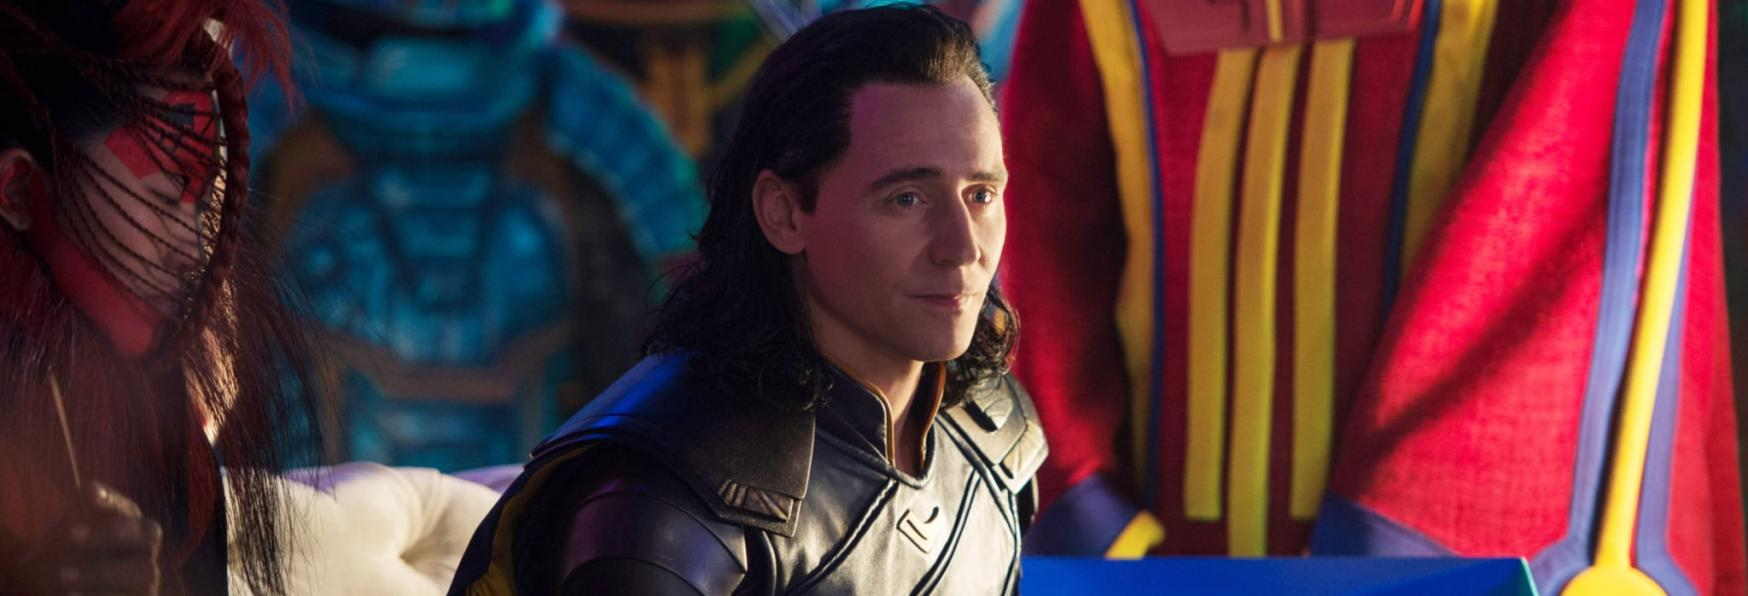 Loki: Rilasciata la Sinossi dell'inedita Serie TV dei Marvel Studios